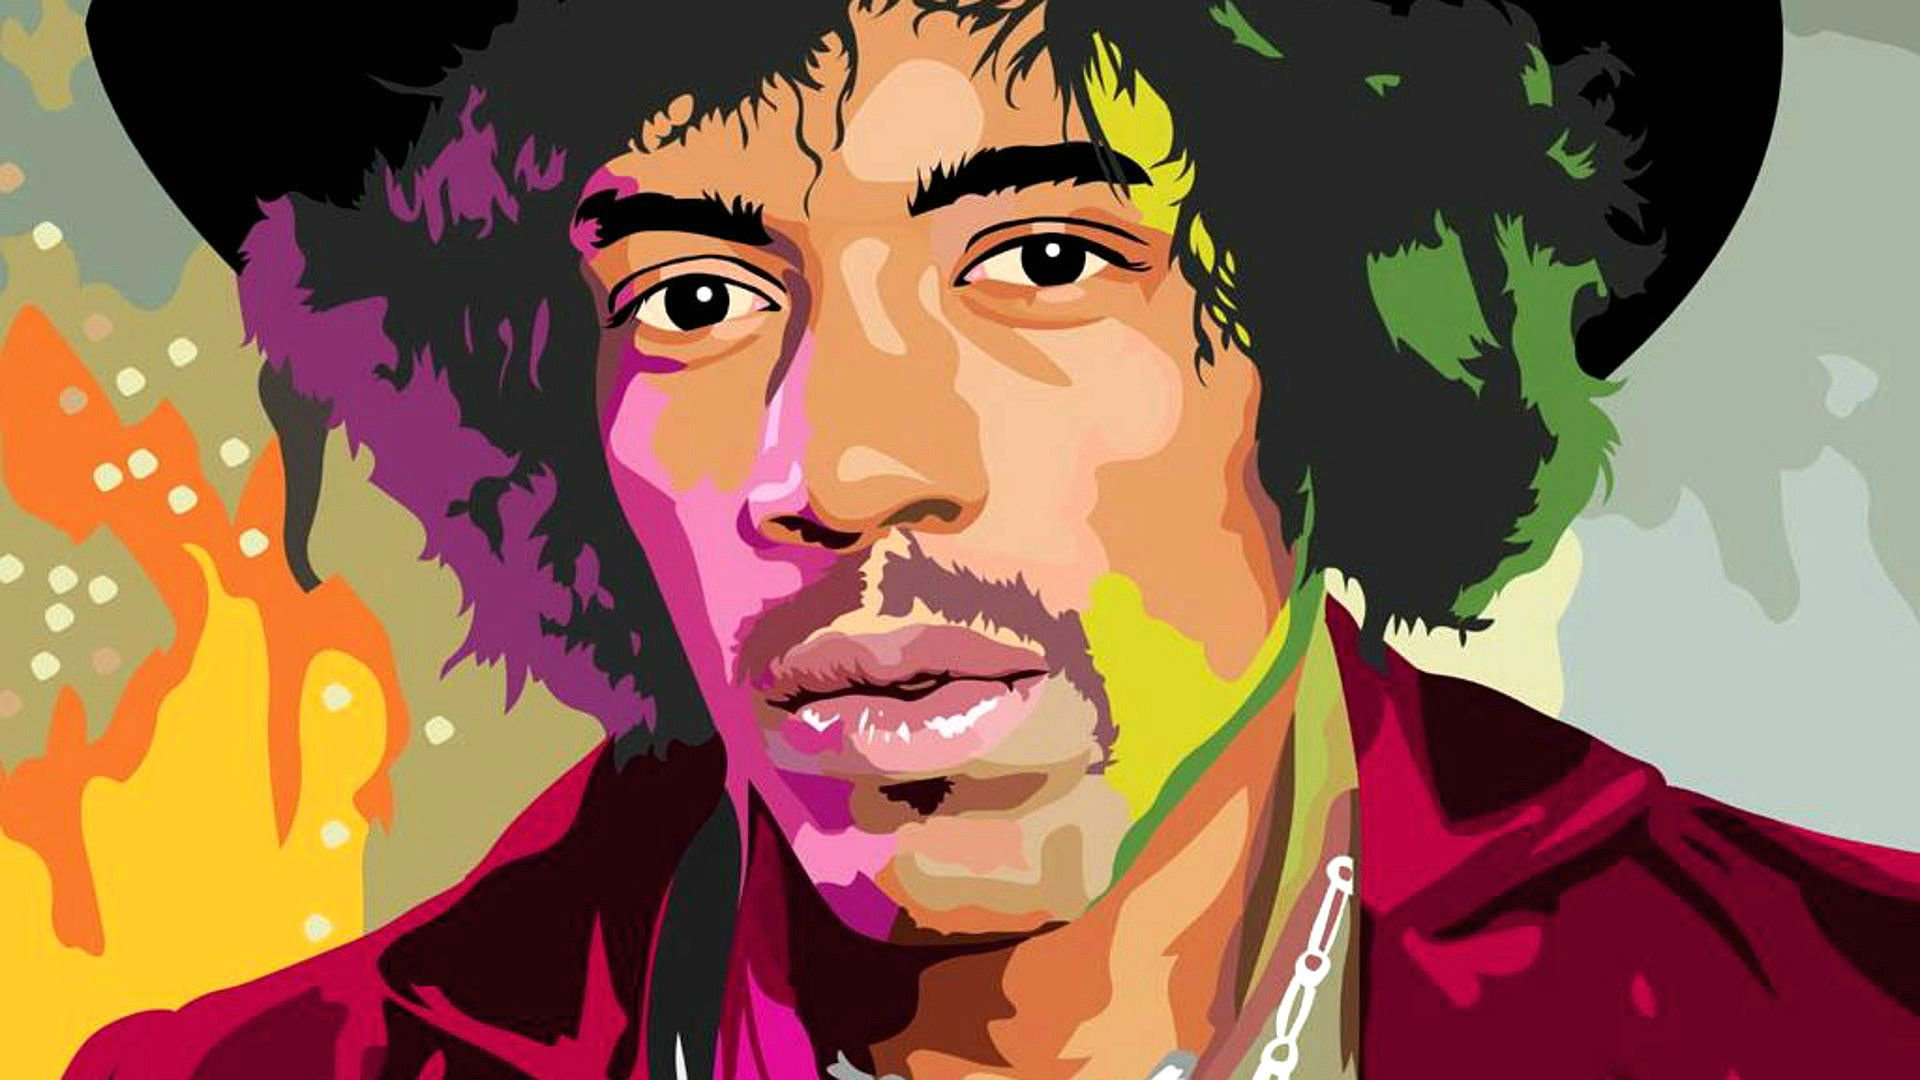 Jimi Hendrix Hard Rock Classic Blues Guitar Wallpaper 1920x1080 425087 Wallpaperup